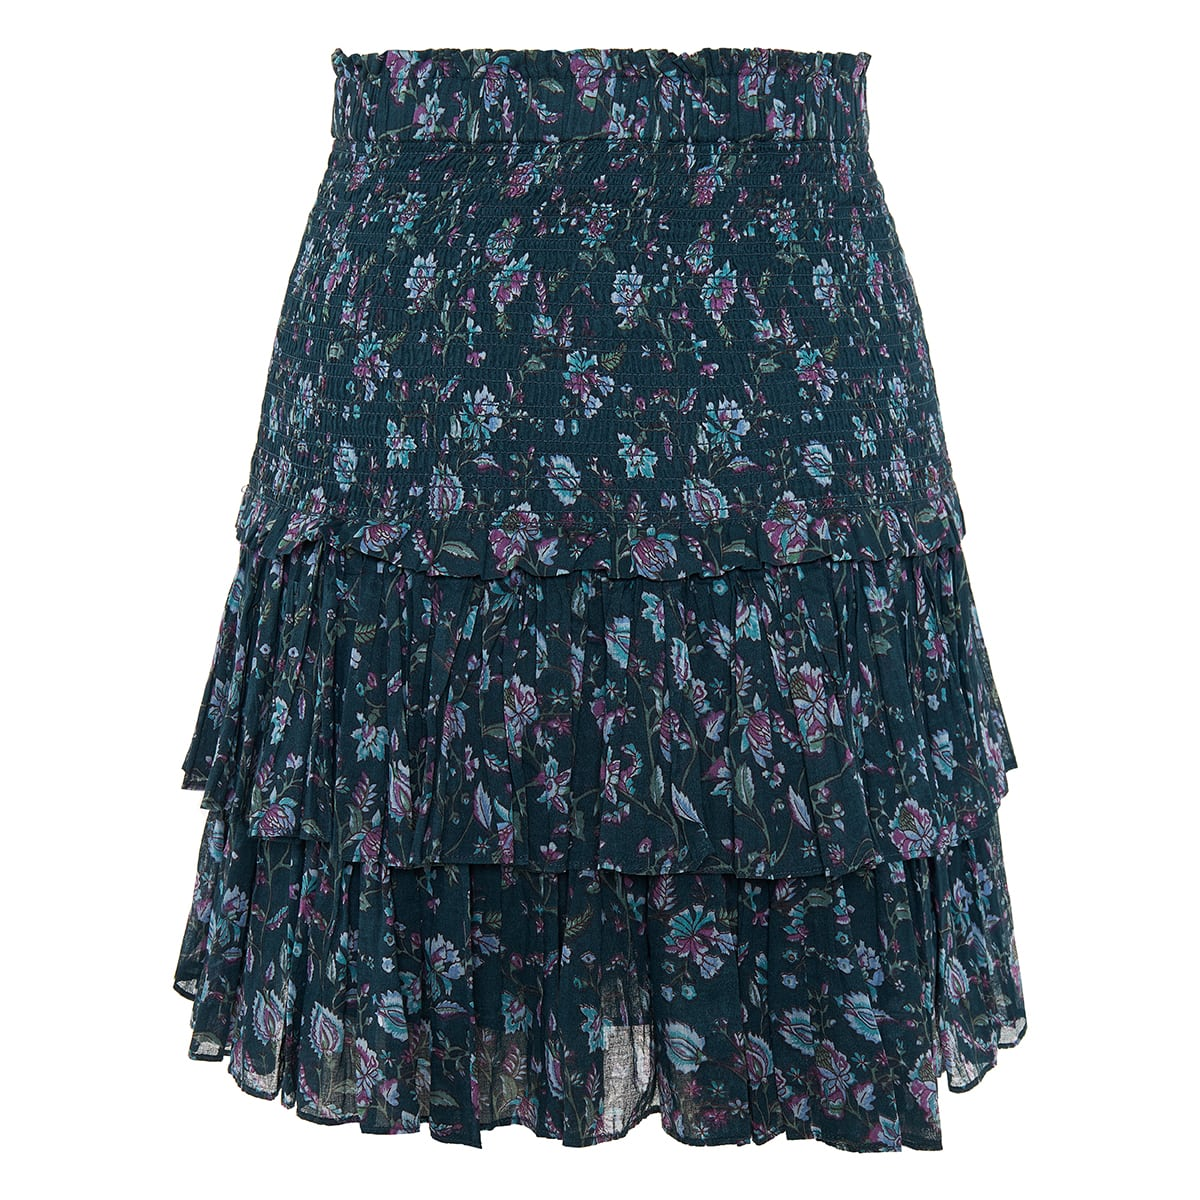 Naomi printed tiered mini skirt